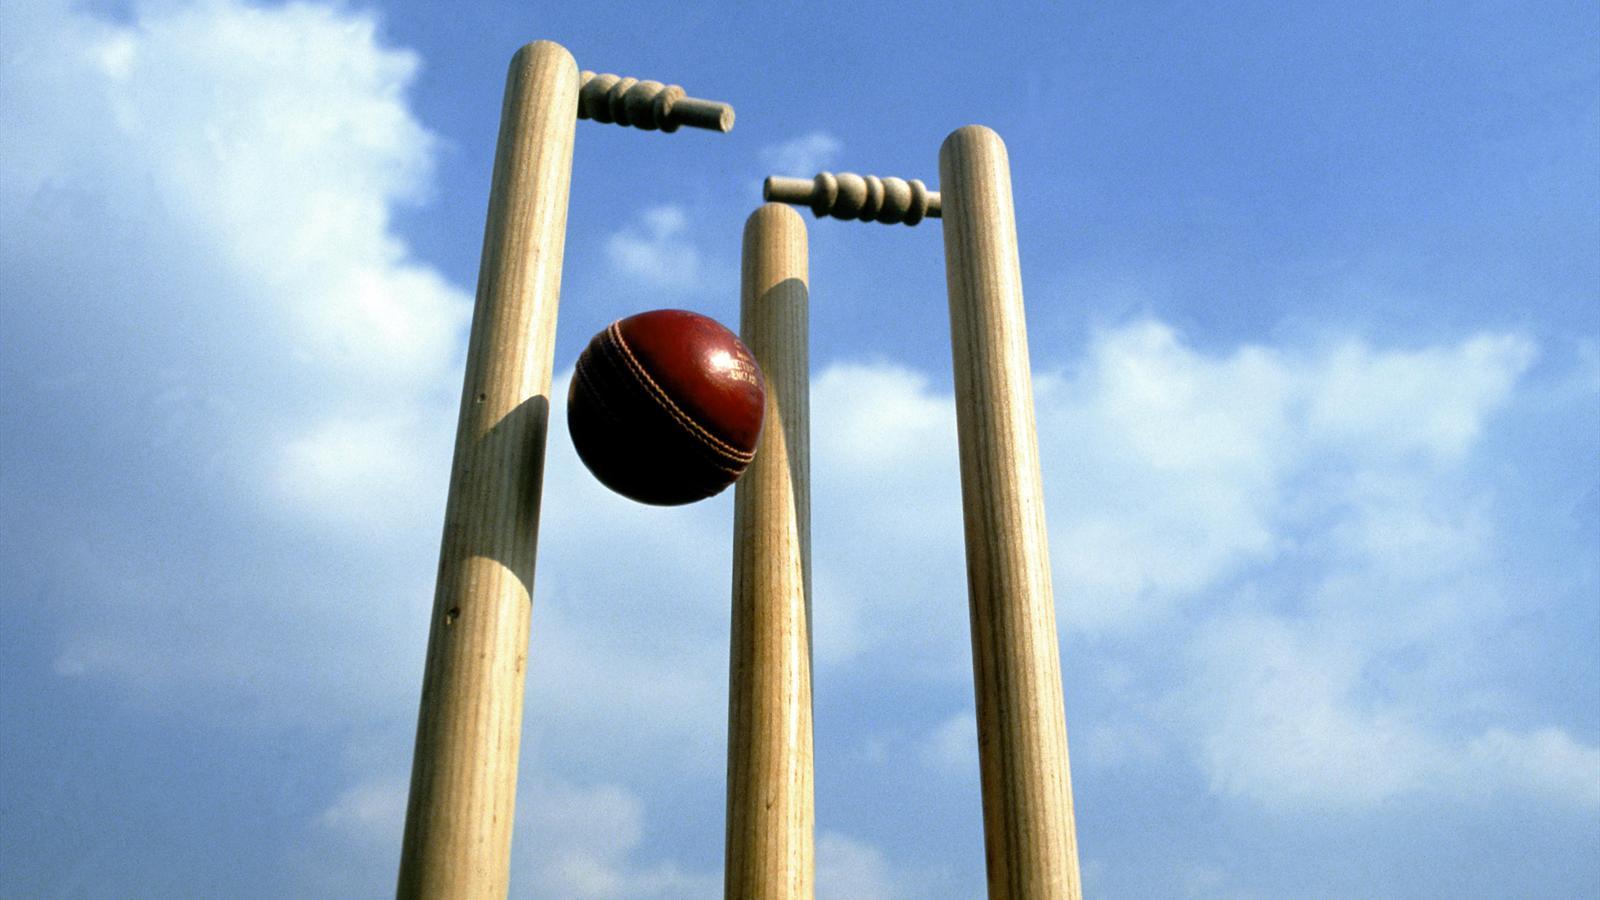 Zimbabwe cricket optimistic Pakistan tour will go ahead - Sports Leo